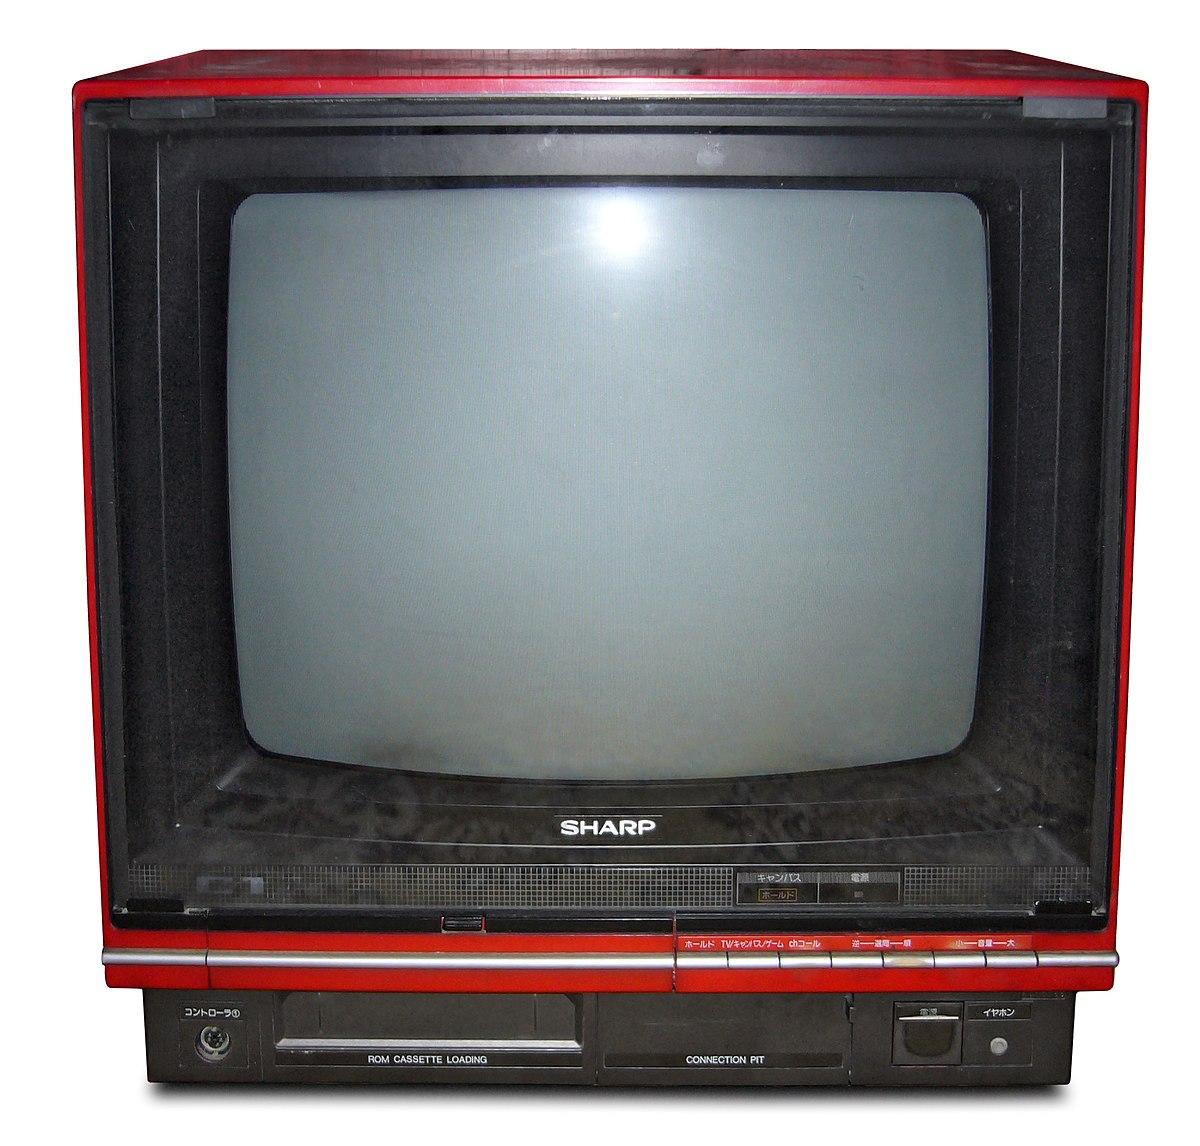 Sharp Nintendo Television - Wikipedia